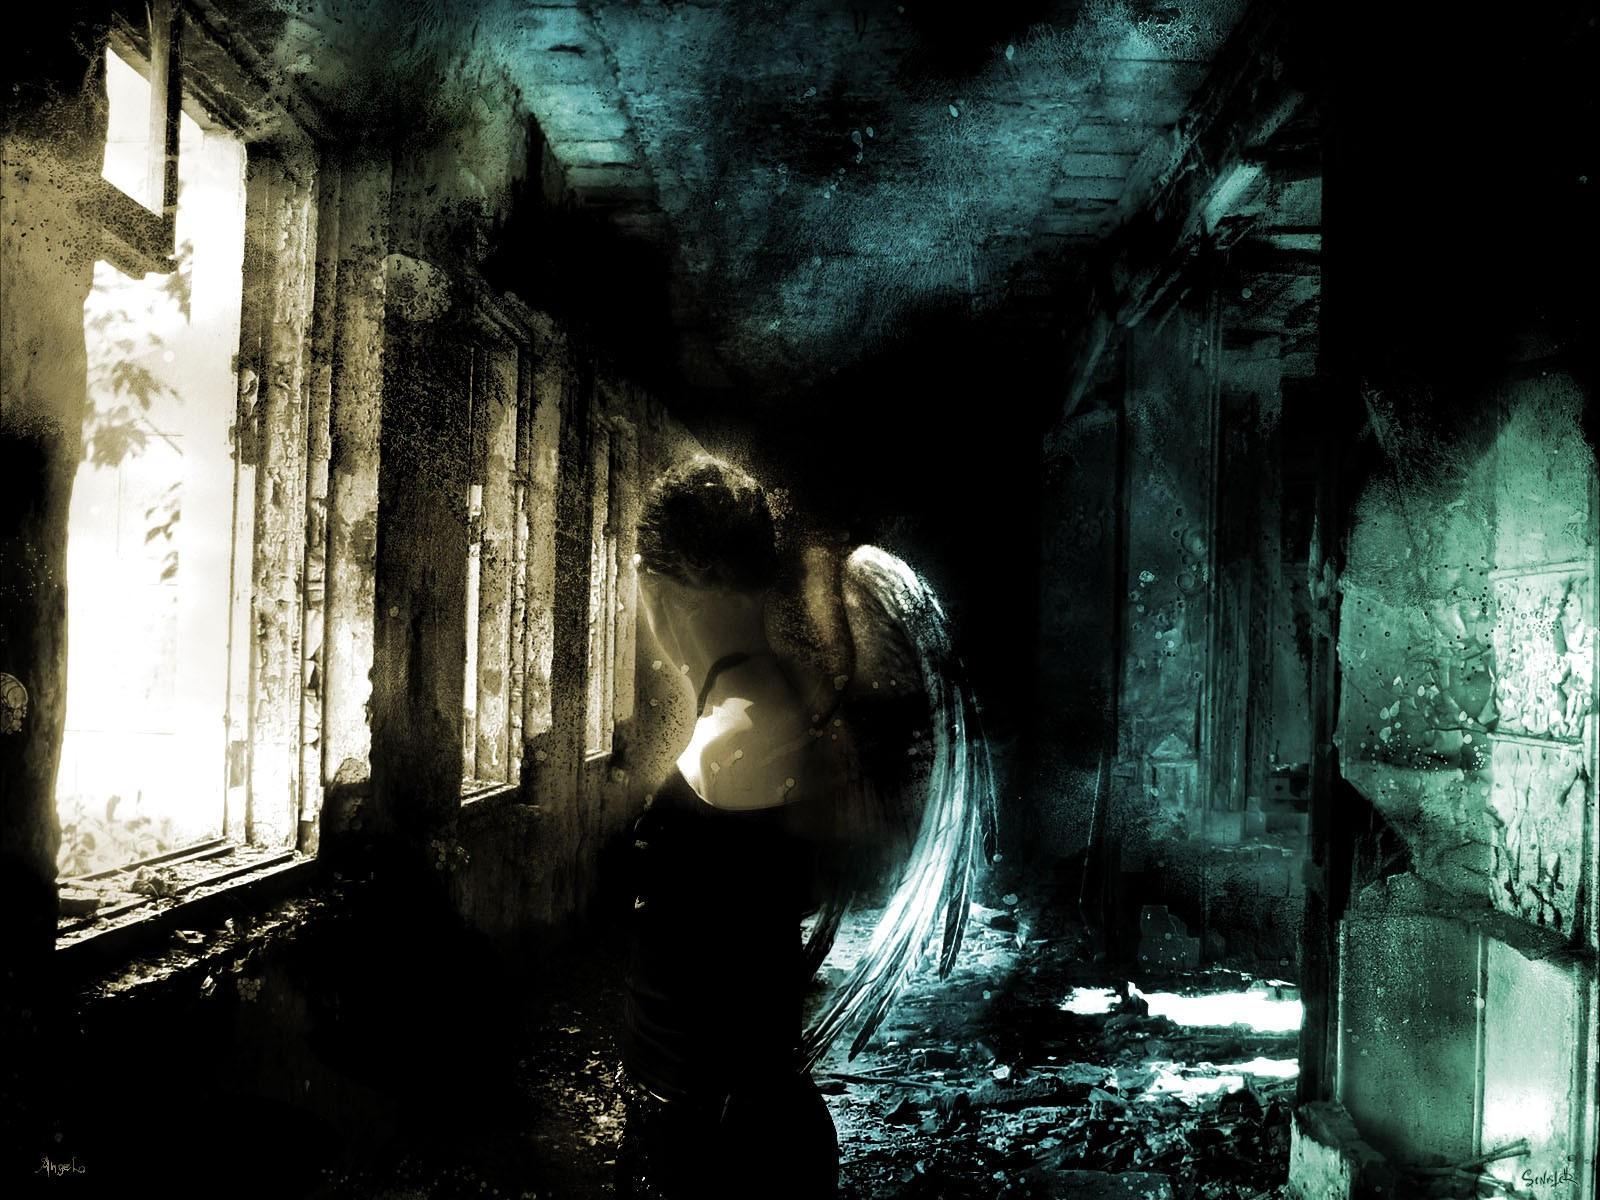 Арт - в мрачном коридоре